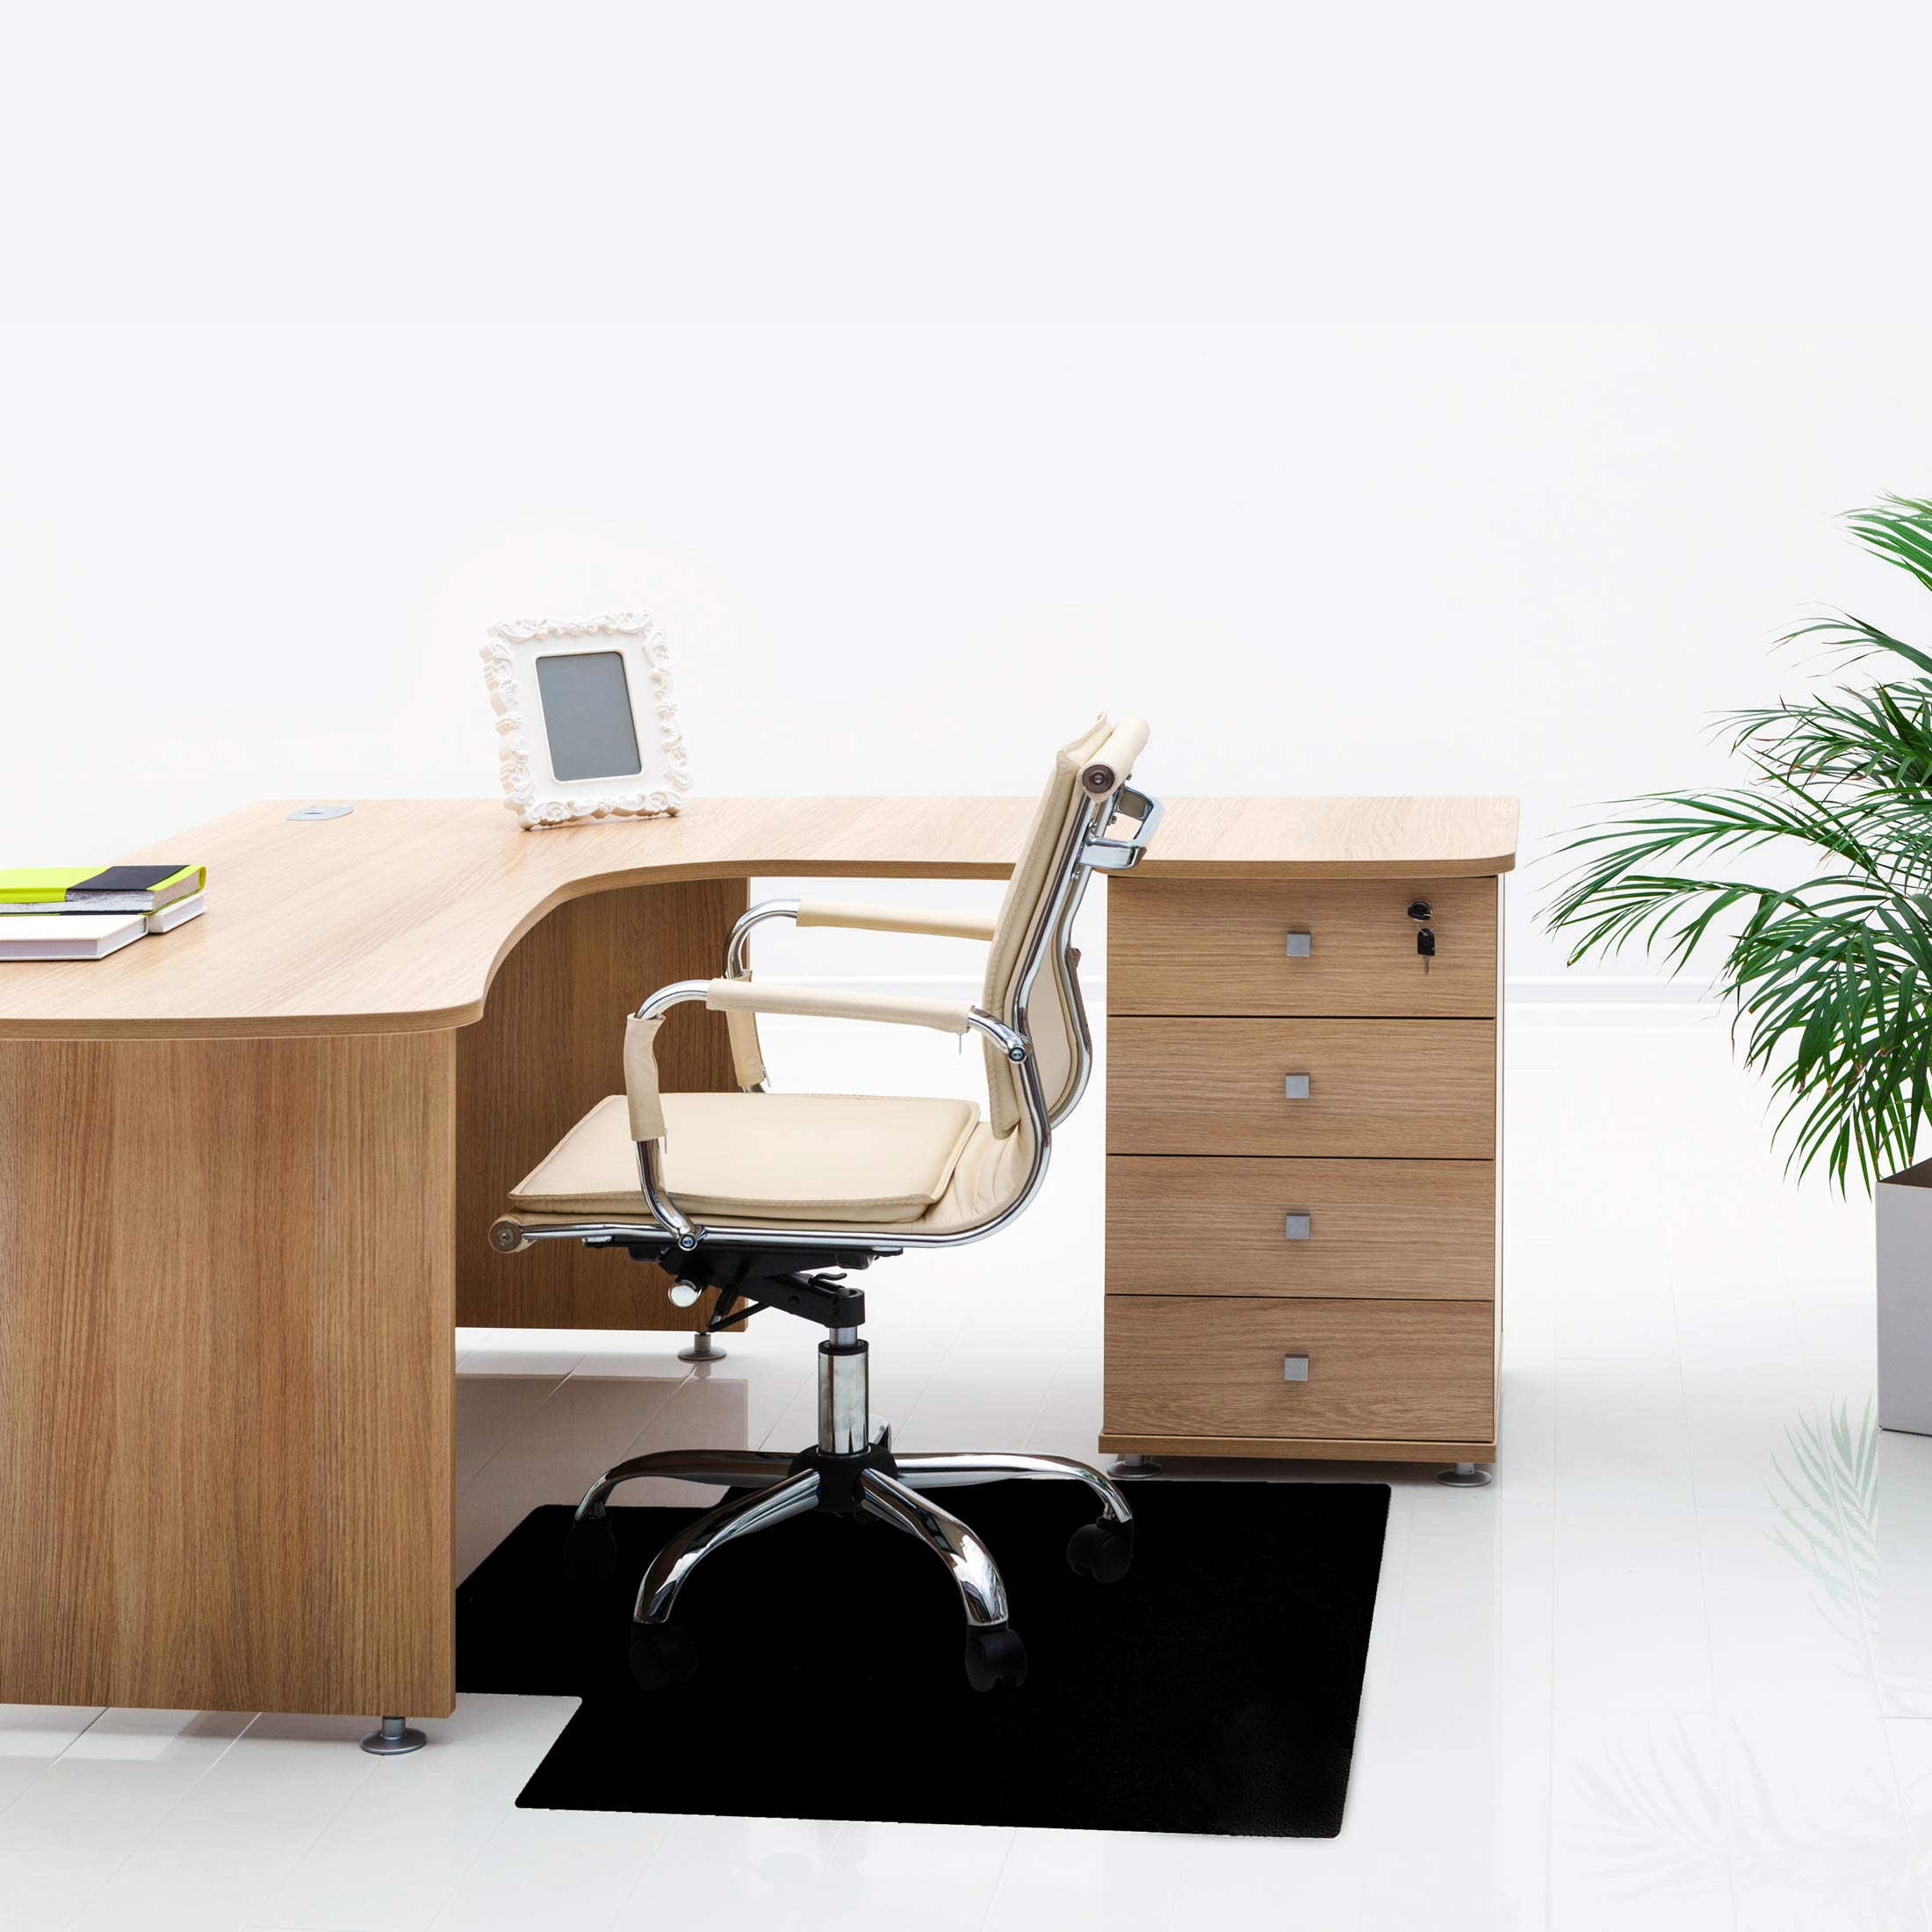 Floortex 黑色椅垫带嘴唇 91.44 cm x 121.92 cm 适用于硬地板